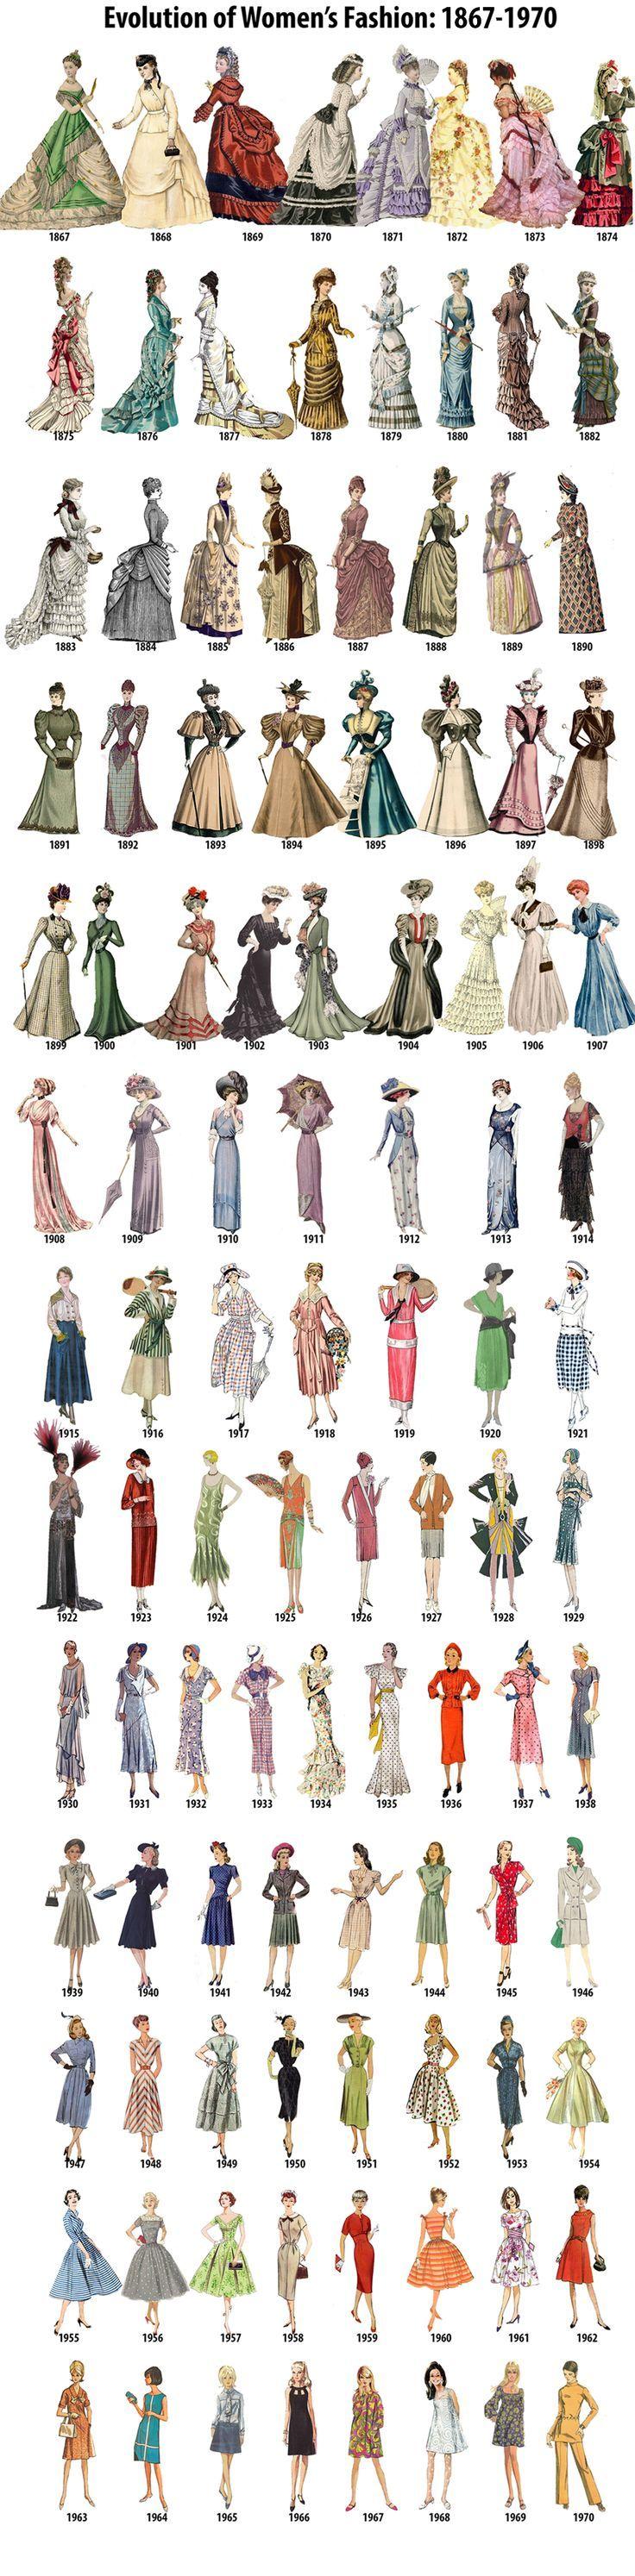 Entwicklung der Damenmode, 1867-1970 – dress